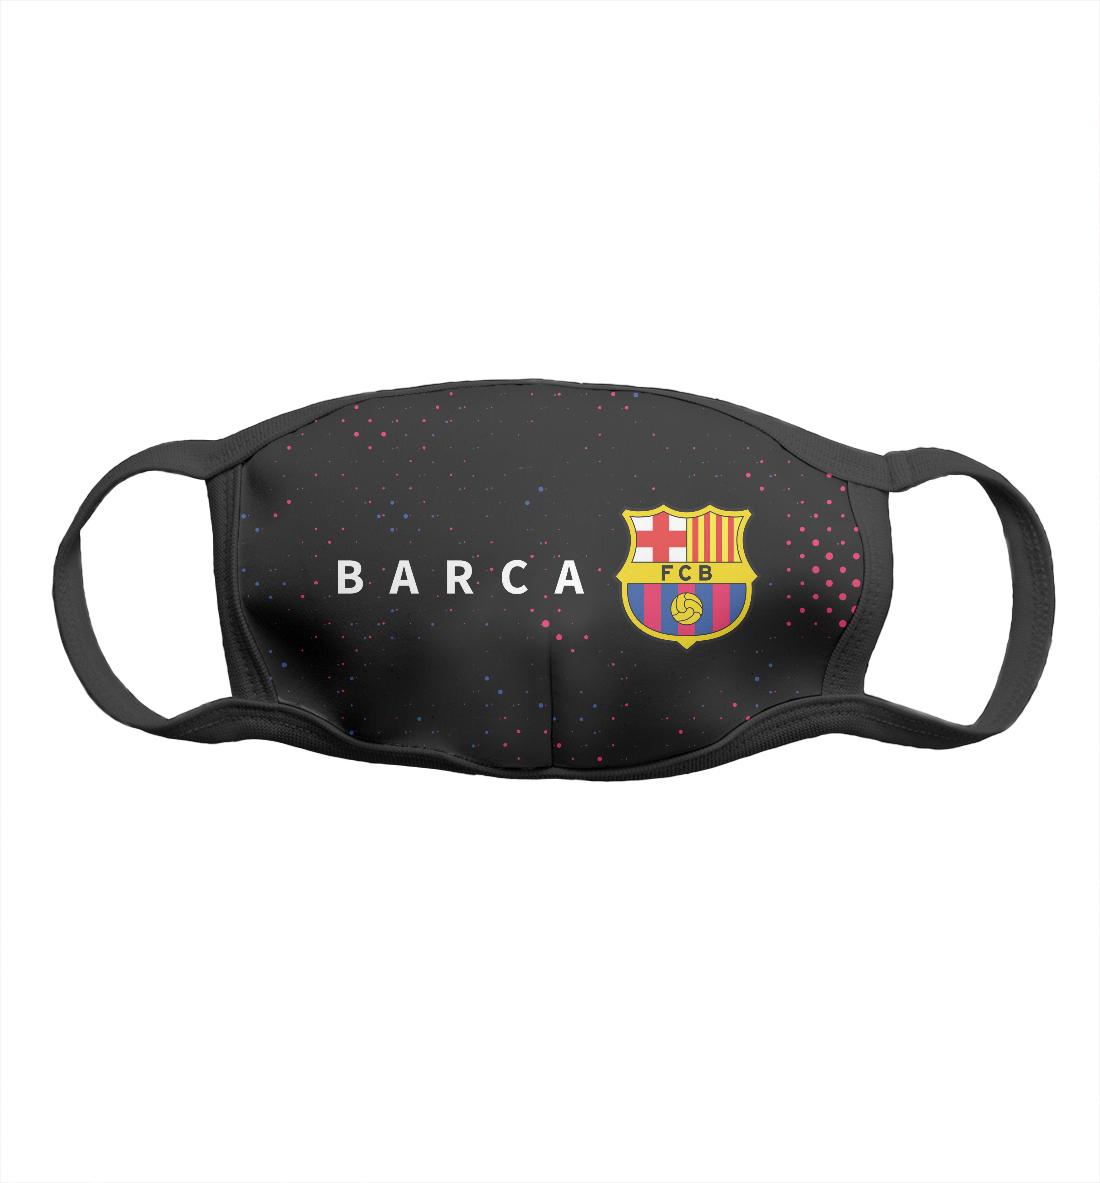 Barcelona / Барселона target ранец fc barcelona барселона 17325 синий красный